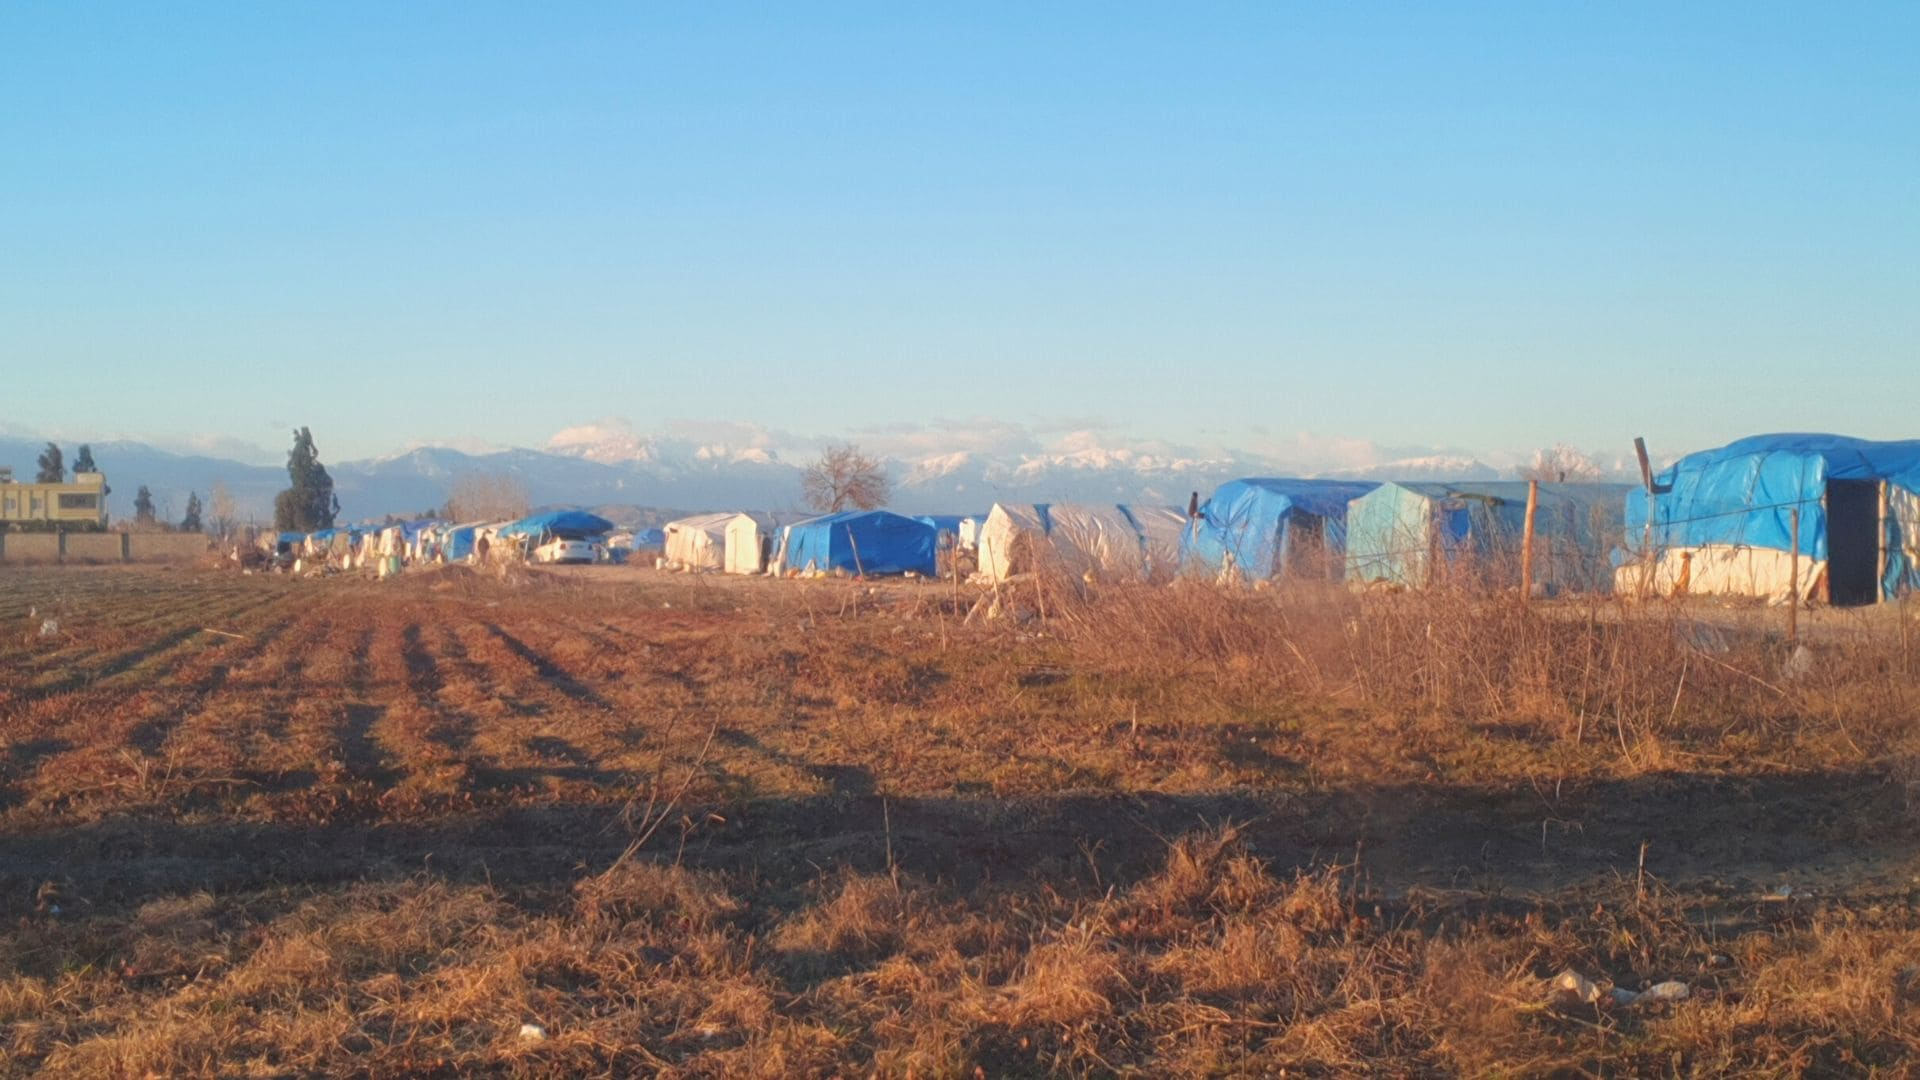 syrische Flüchtlingscamps